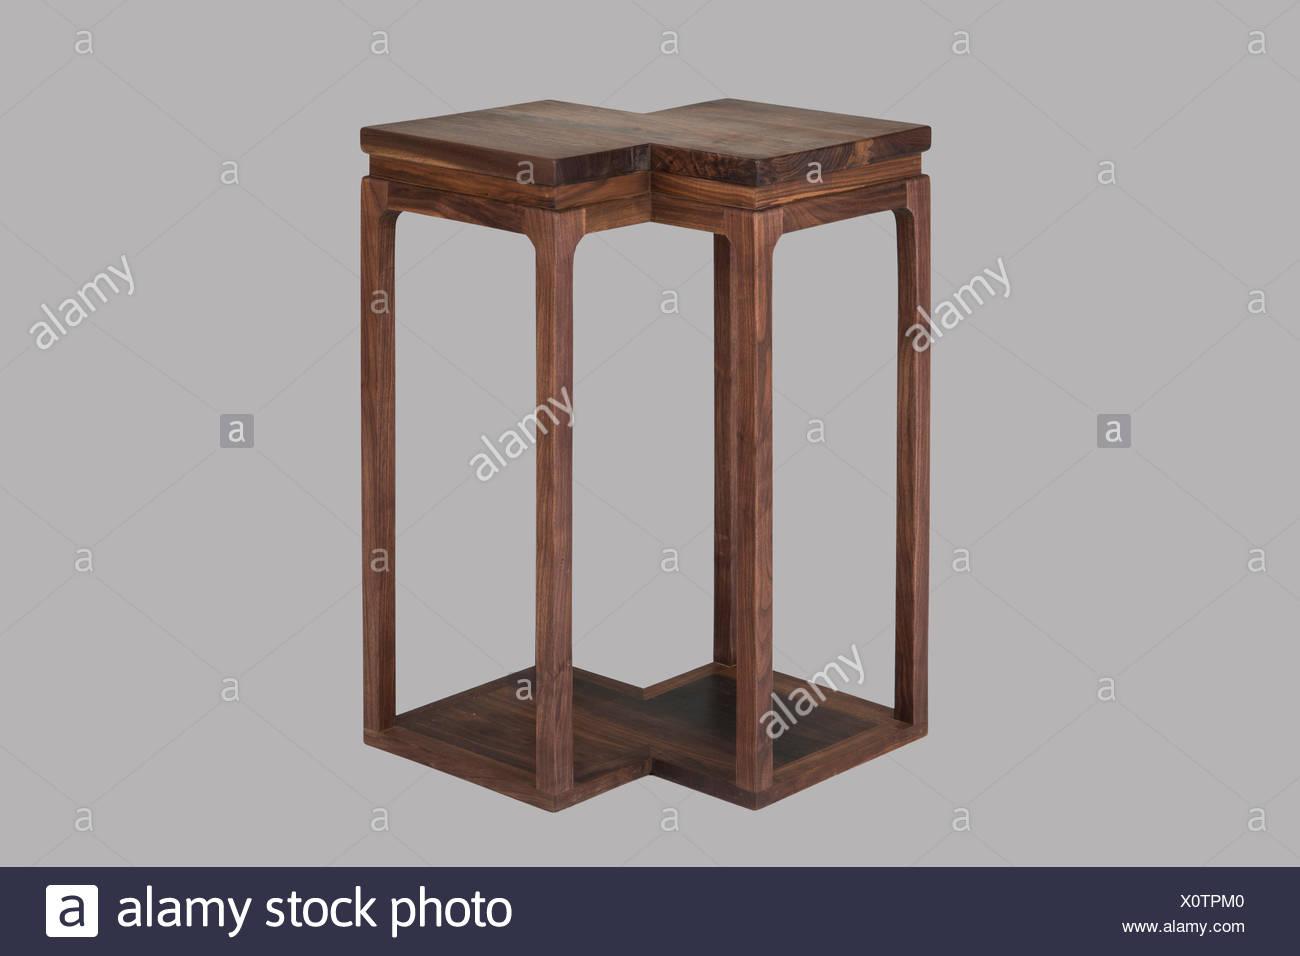 Furniture of Antiquity - Furniture Of Antiquity Stock Photo: 275910544 - Alamy